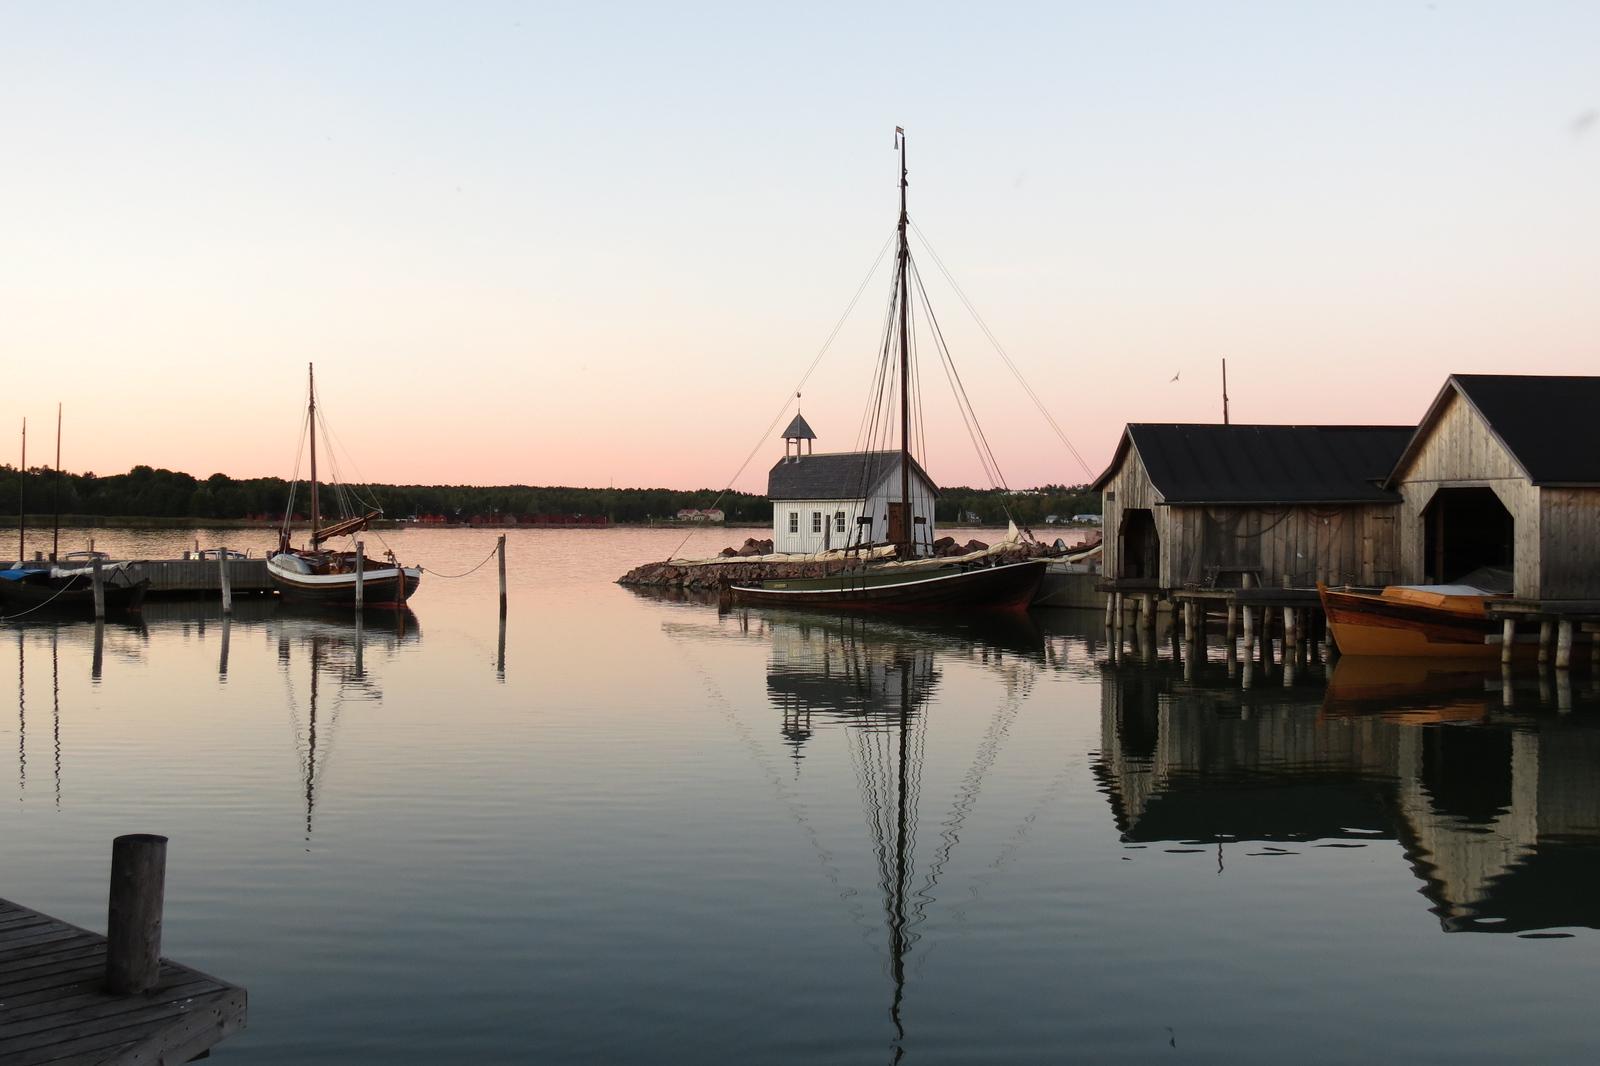 Finland: Turku and the Åland Islands Bike